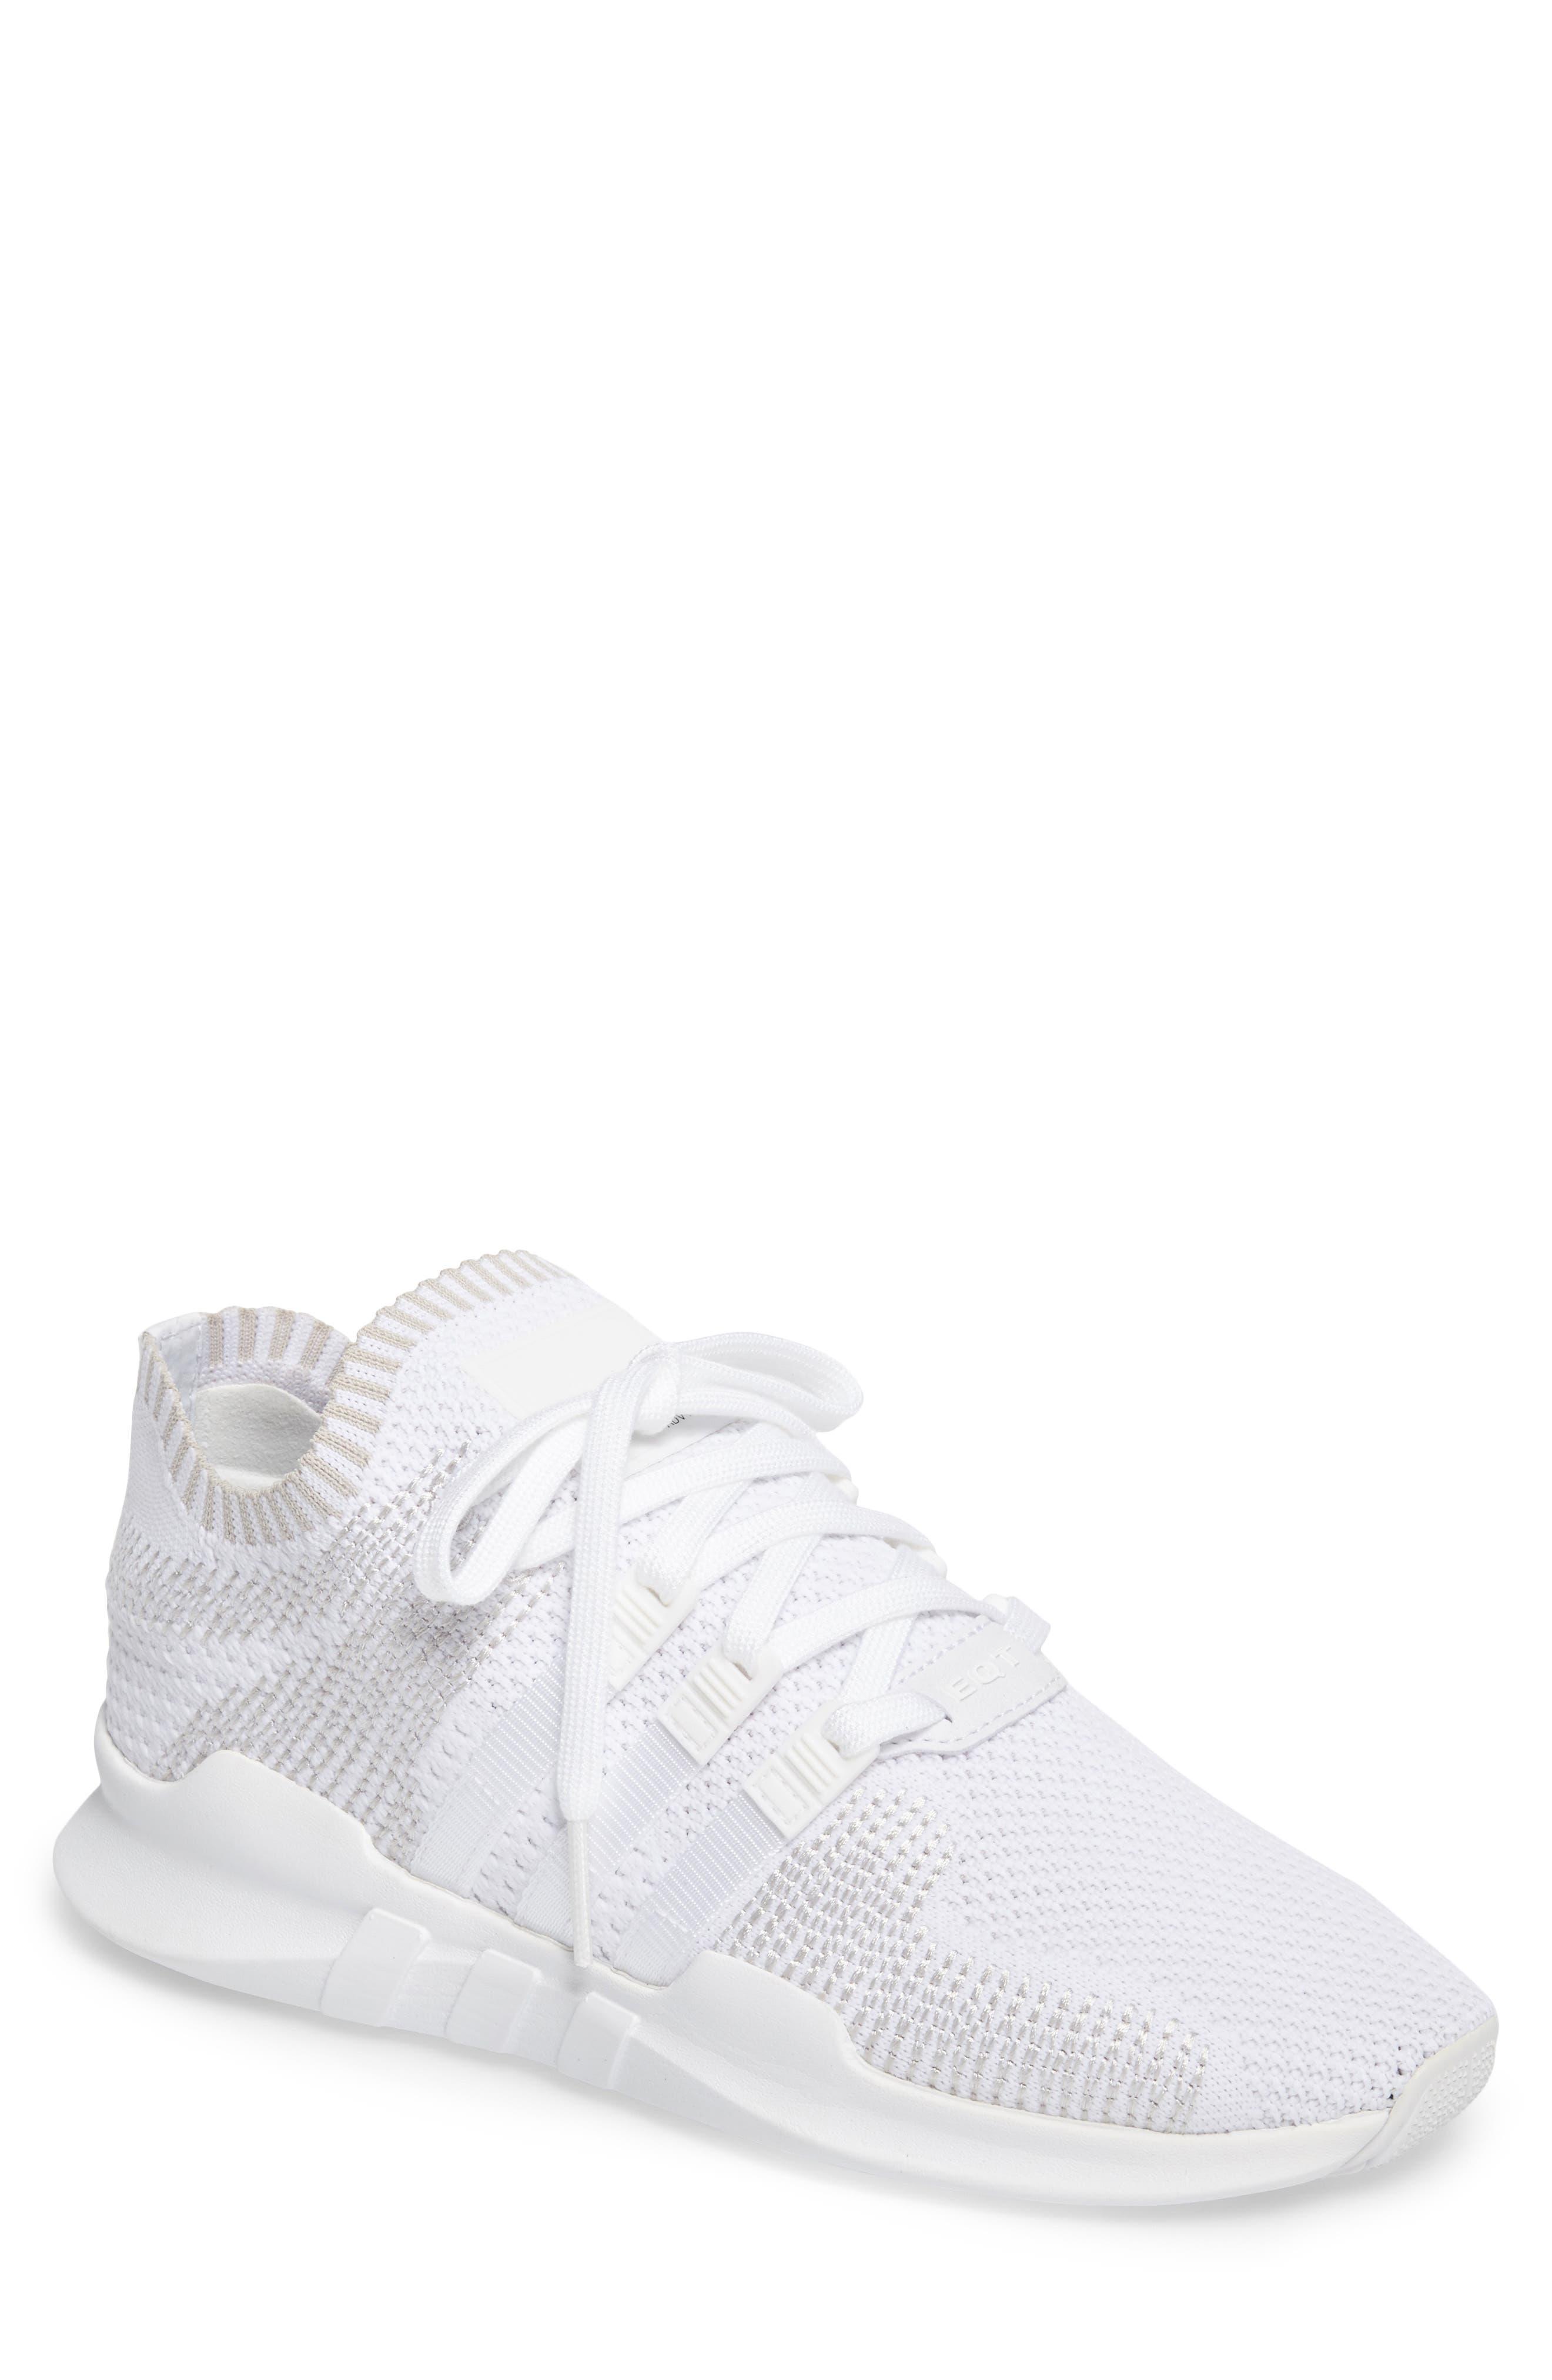 EQT Support ADV PrimeKnit Sneaker,                             Main thumbnail 1, color,                             White/ White/ Sub Green